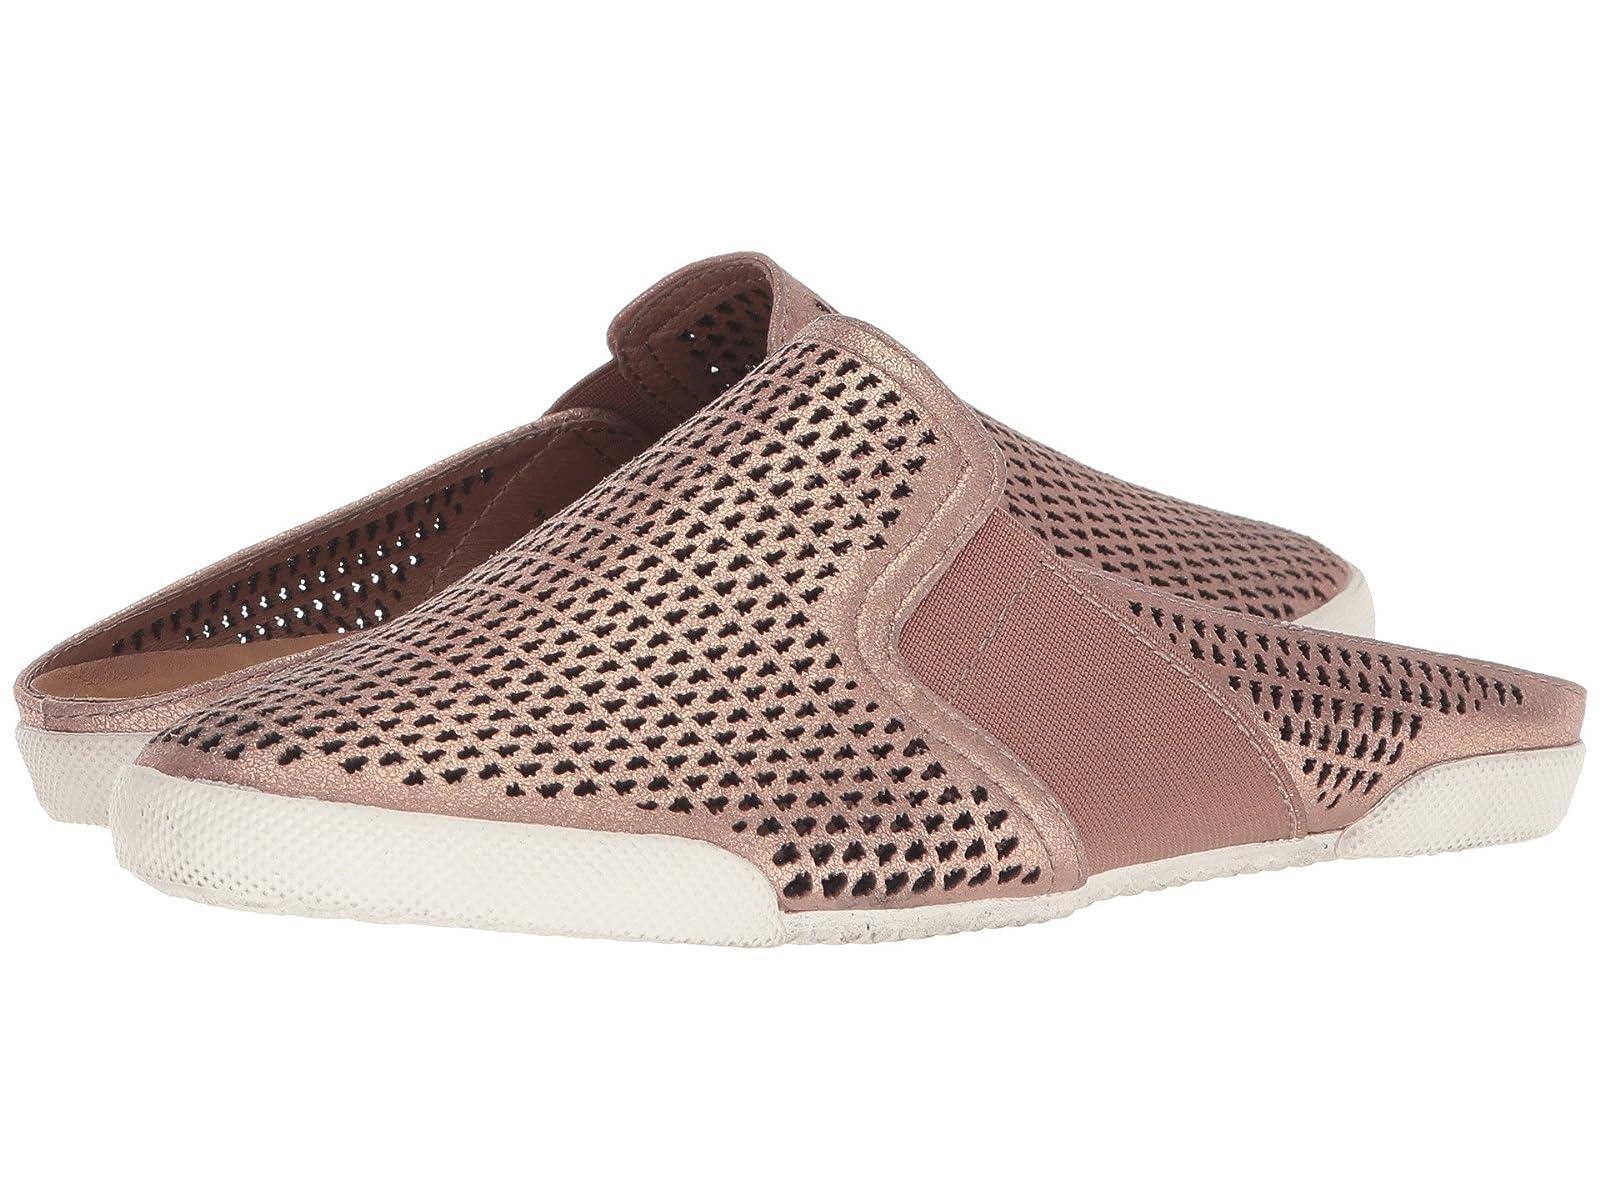 Frye Melanie Perf MuleAtmospheric grades have affordable shoes